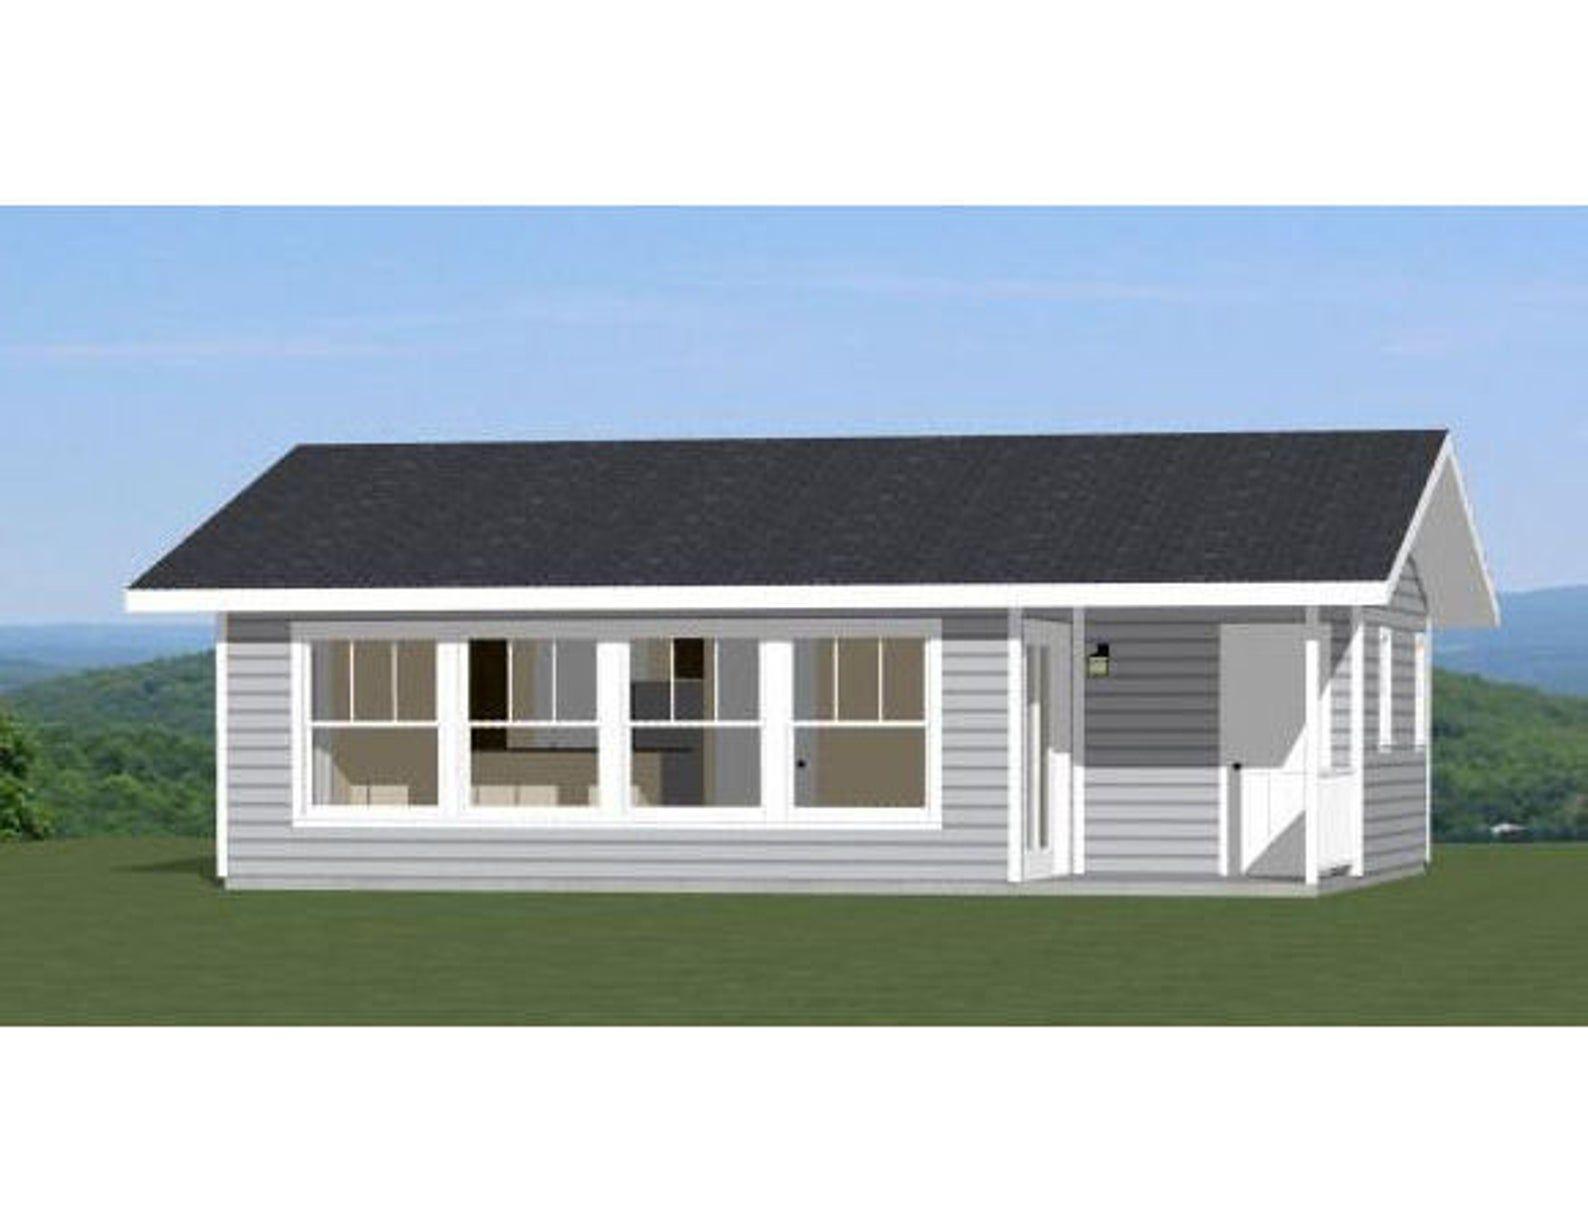 30x24 House 1 Bedroom 1 Bath 657 sq ft PDF Floor Plan Instant Download Model 1A